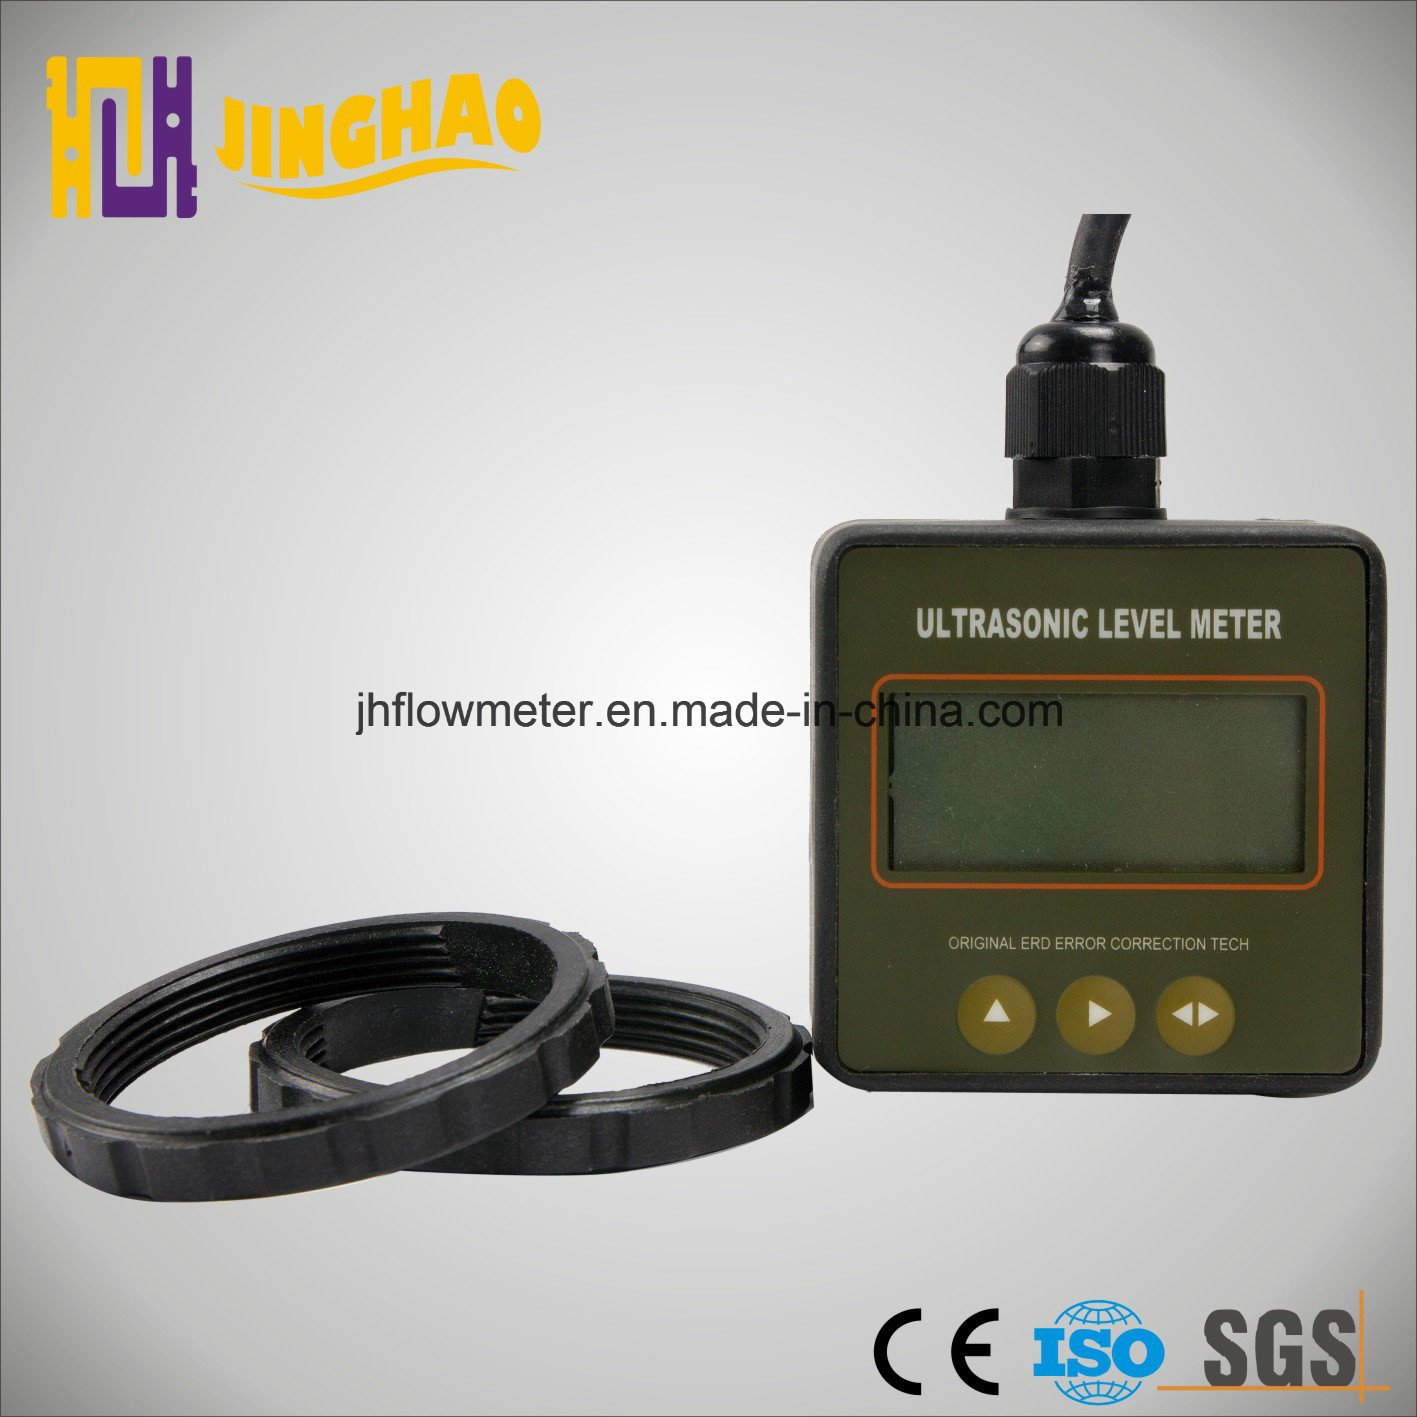 Mini Ultrasonic Liquid Level Meter with LCD Display (JH-ULM-CSA)